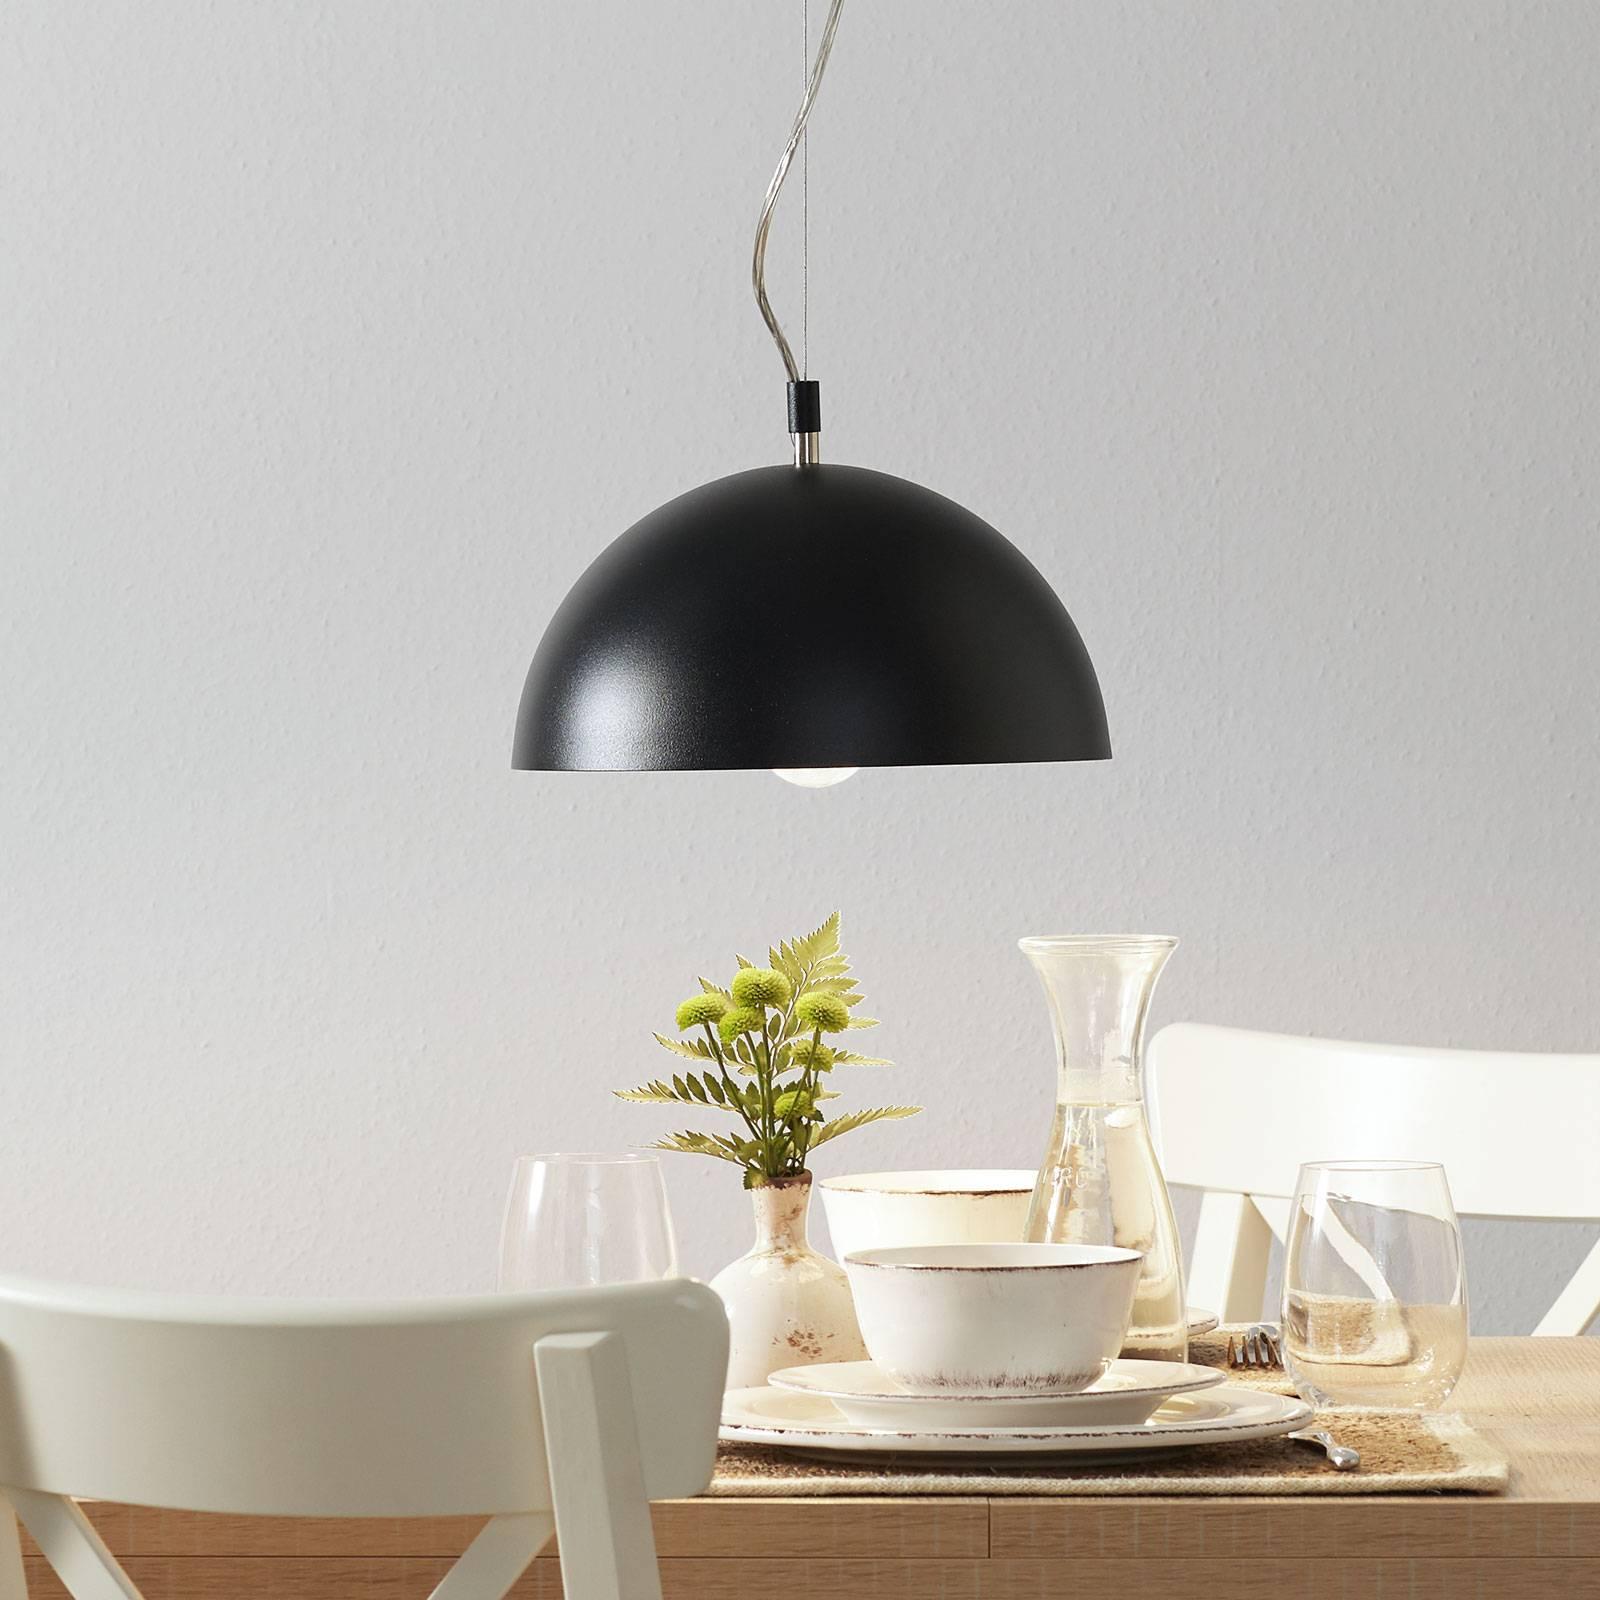 Lucande Maleo lampa wisząca 30cm czarna